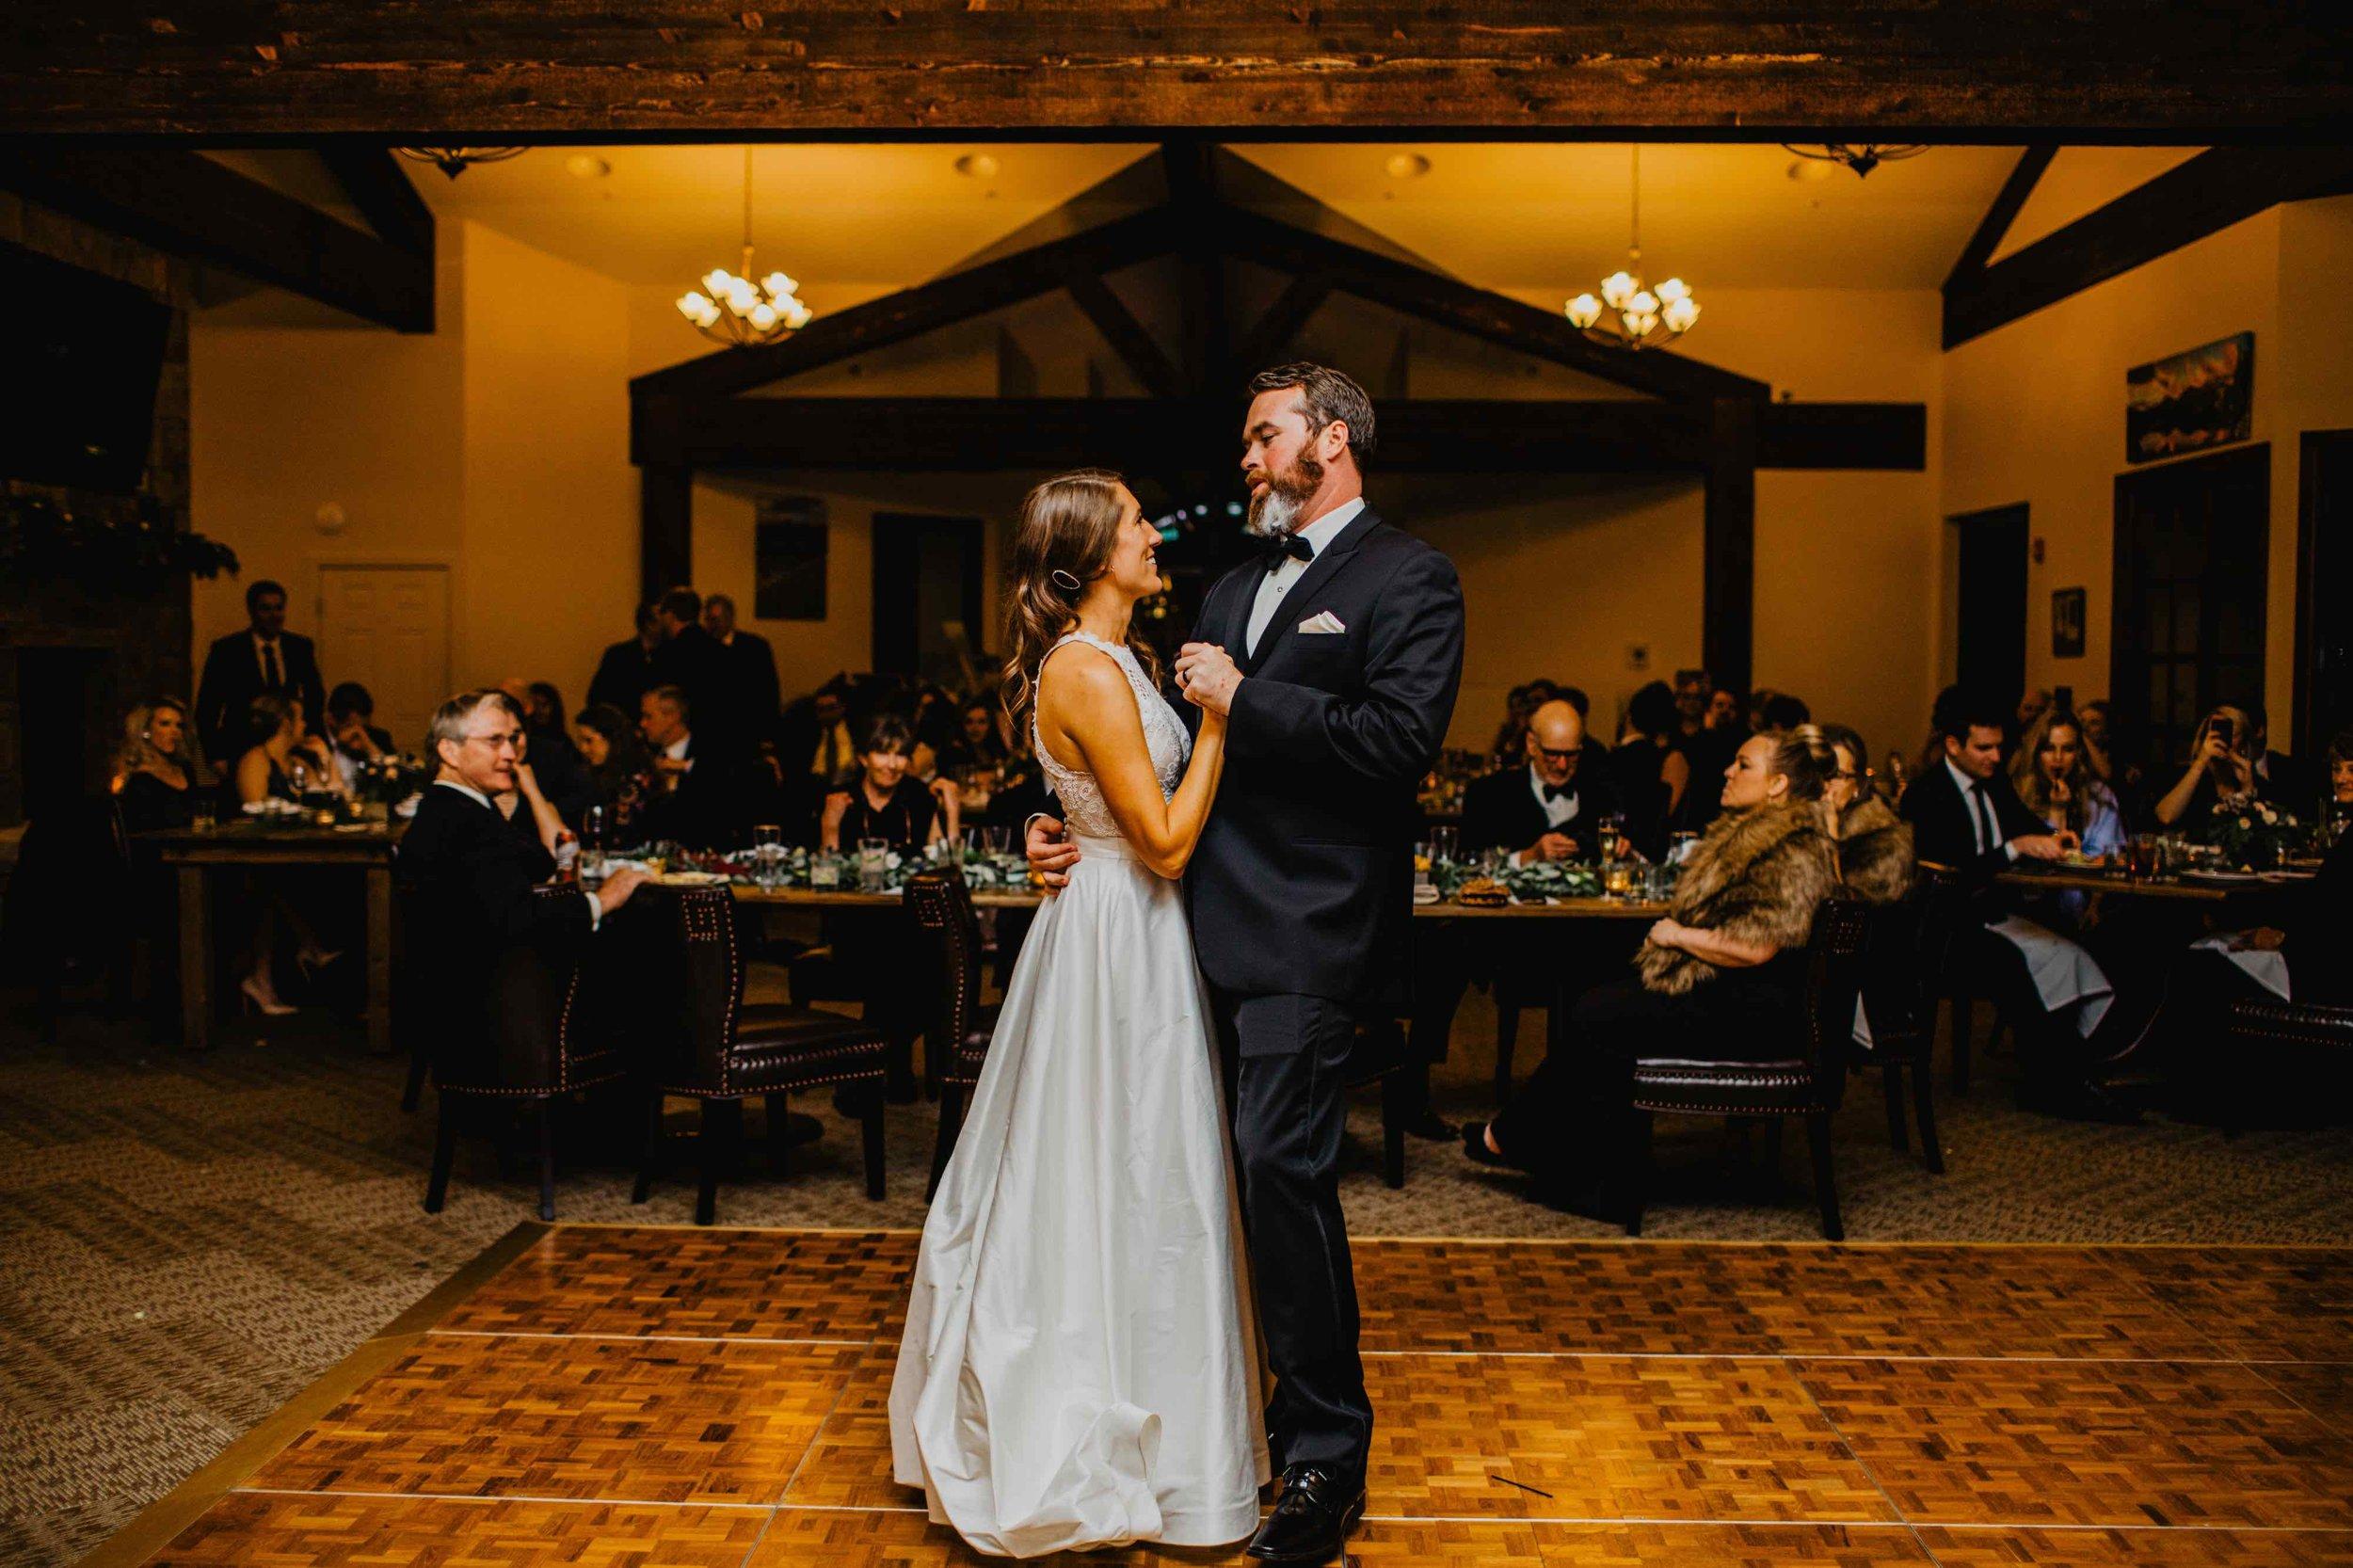 Kisa Conrad Favorites-0051-colorado-wedding-photographer-denver-springs-vailhotel-glenwood-springs-colorado-wedding-photographer.jpeg